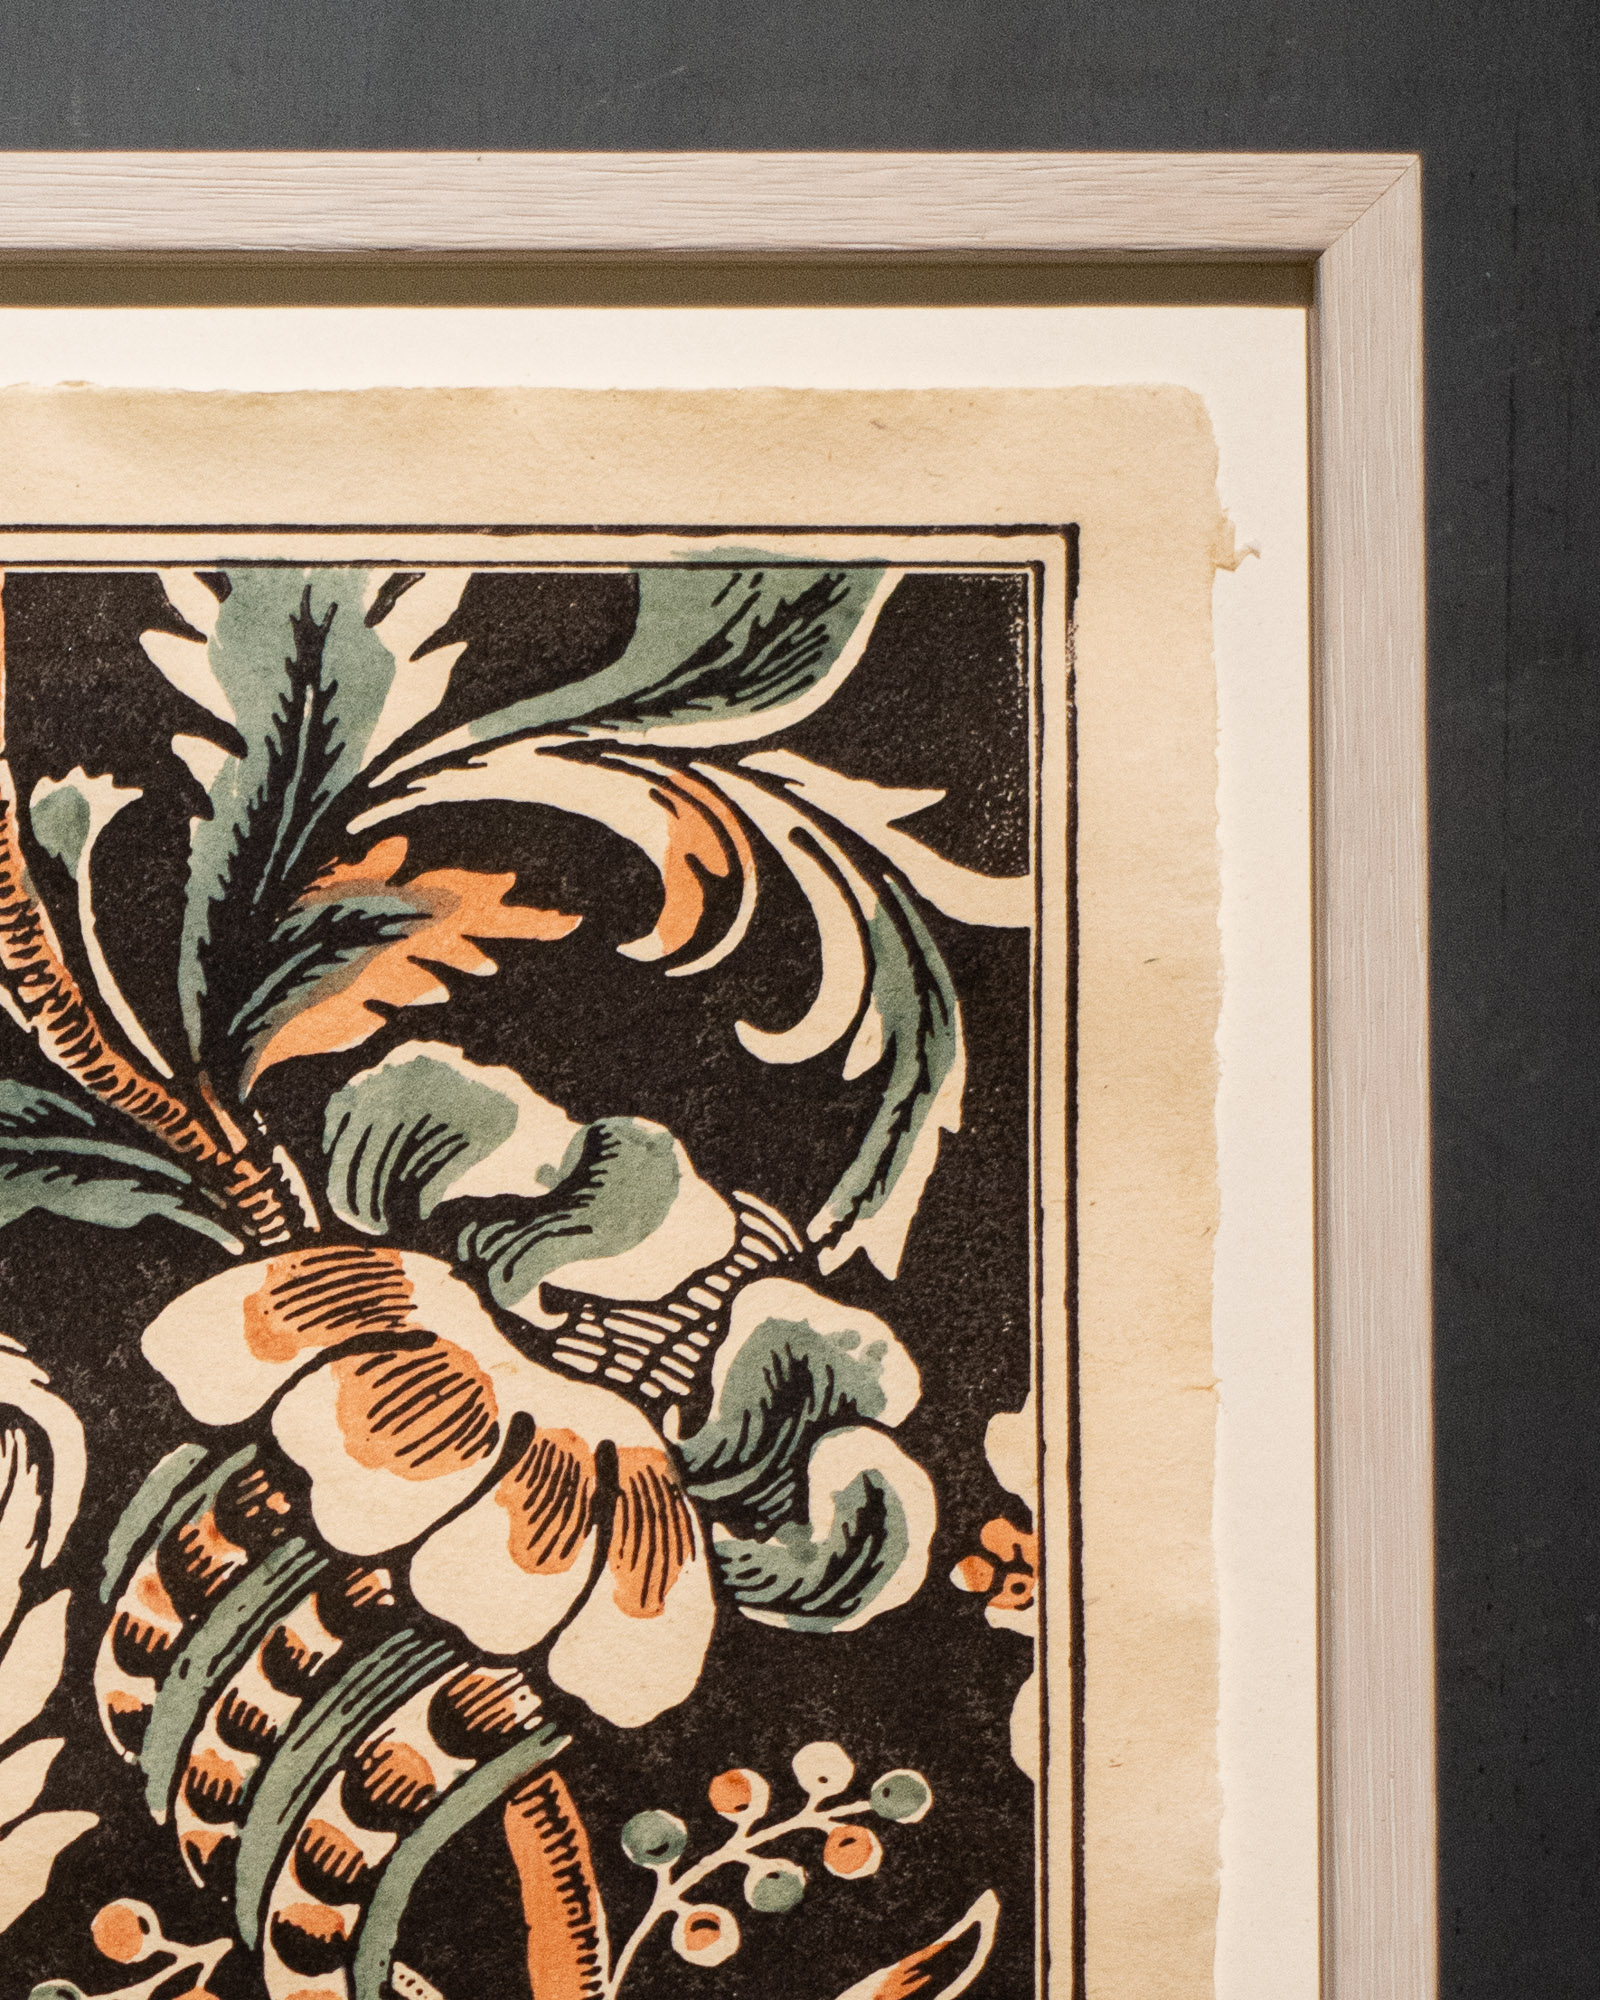 Domino Wandbild 59A GRANDS PAVOTS / Große Mohnblume